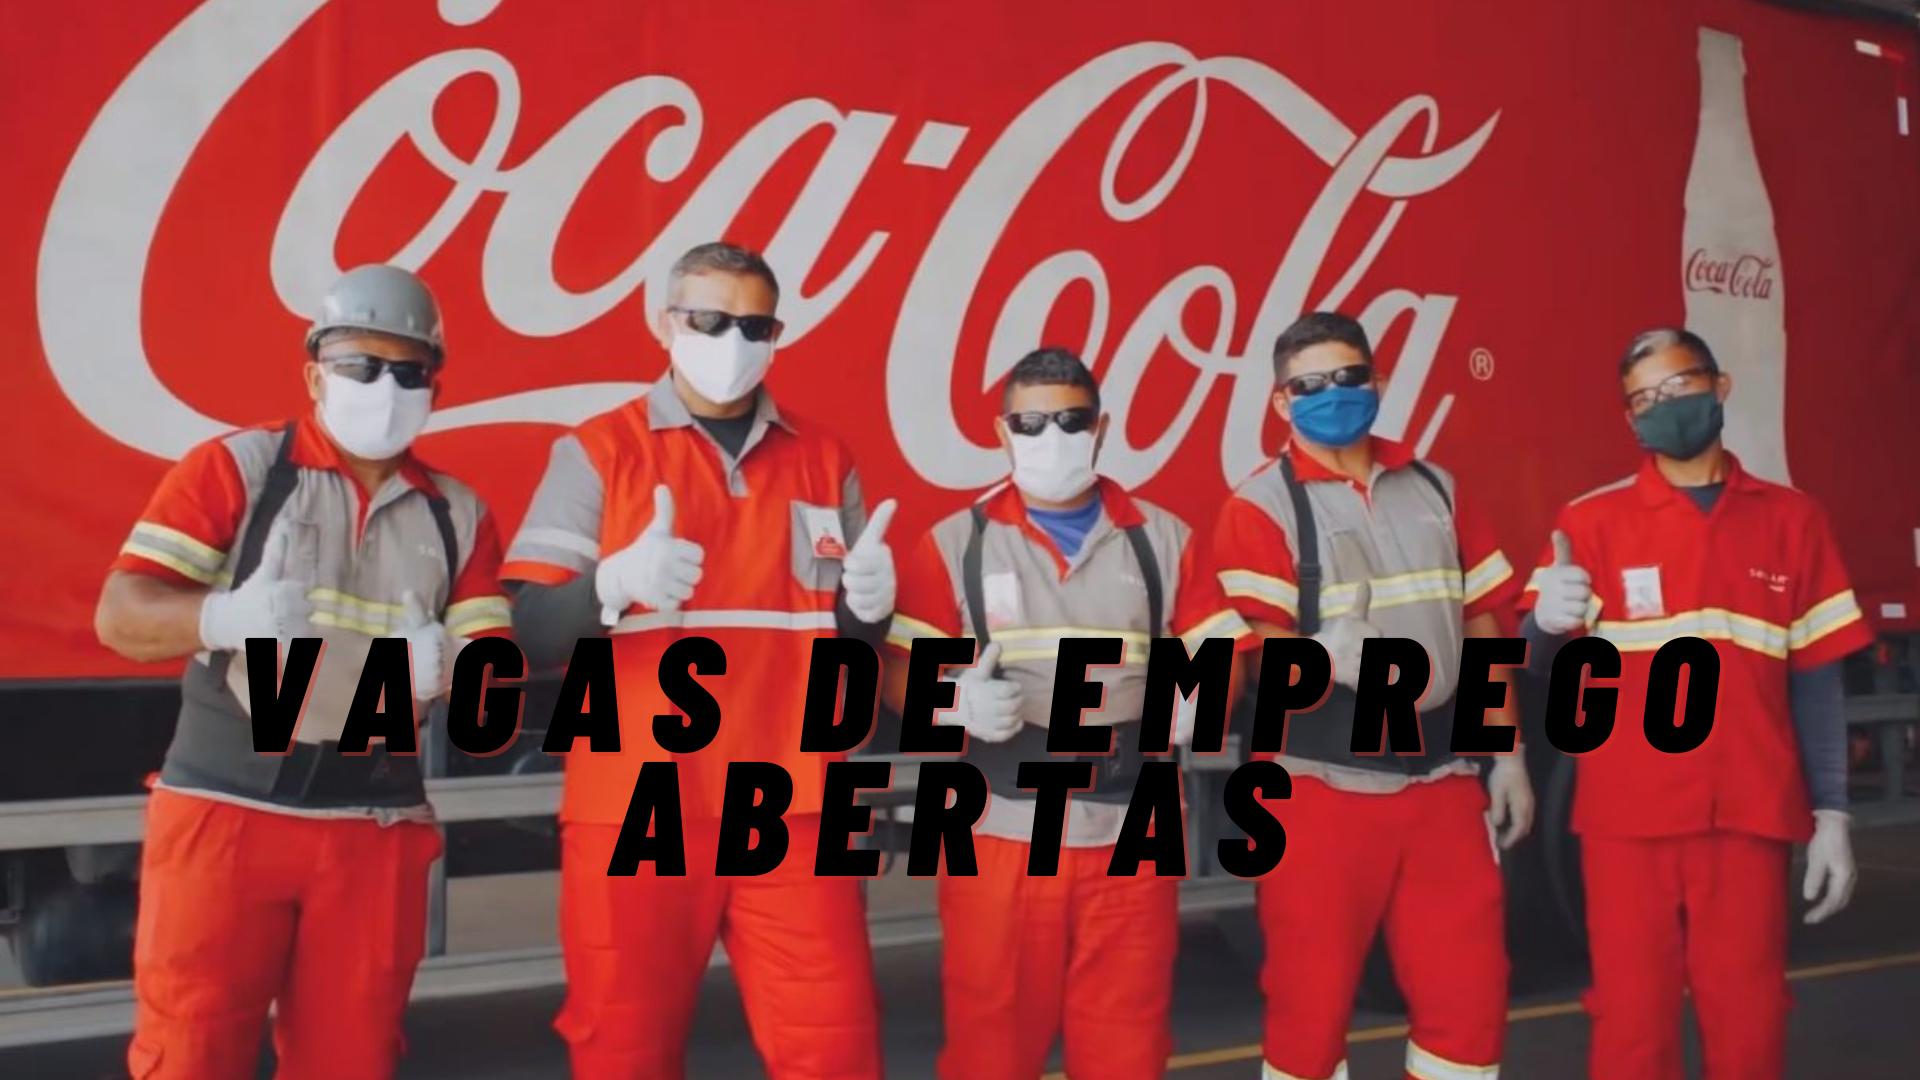 Coca-Cola – emprego – vagas de emprego